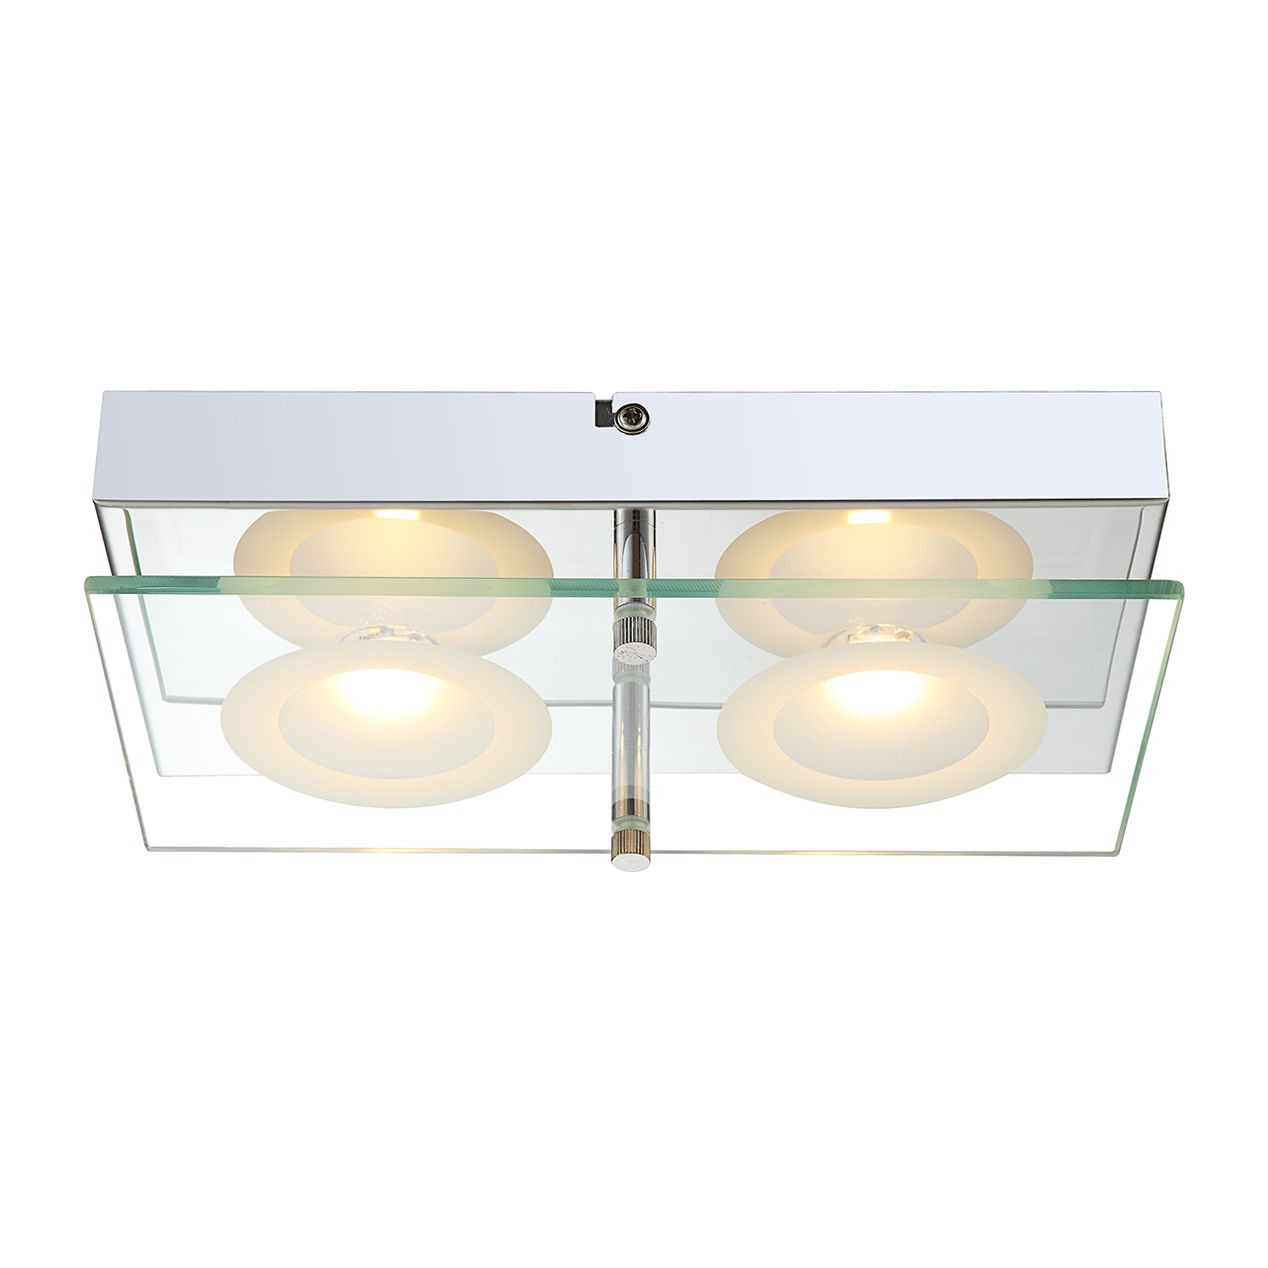 LED-Wandleuchte Oda 2-flammig